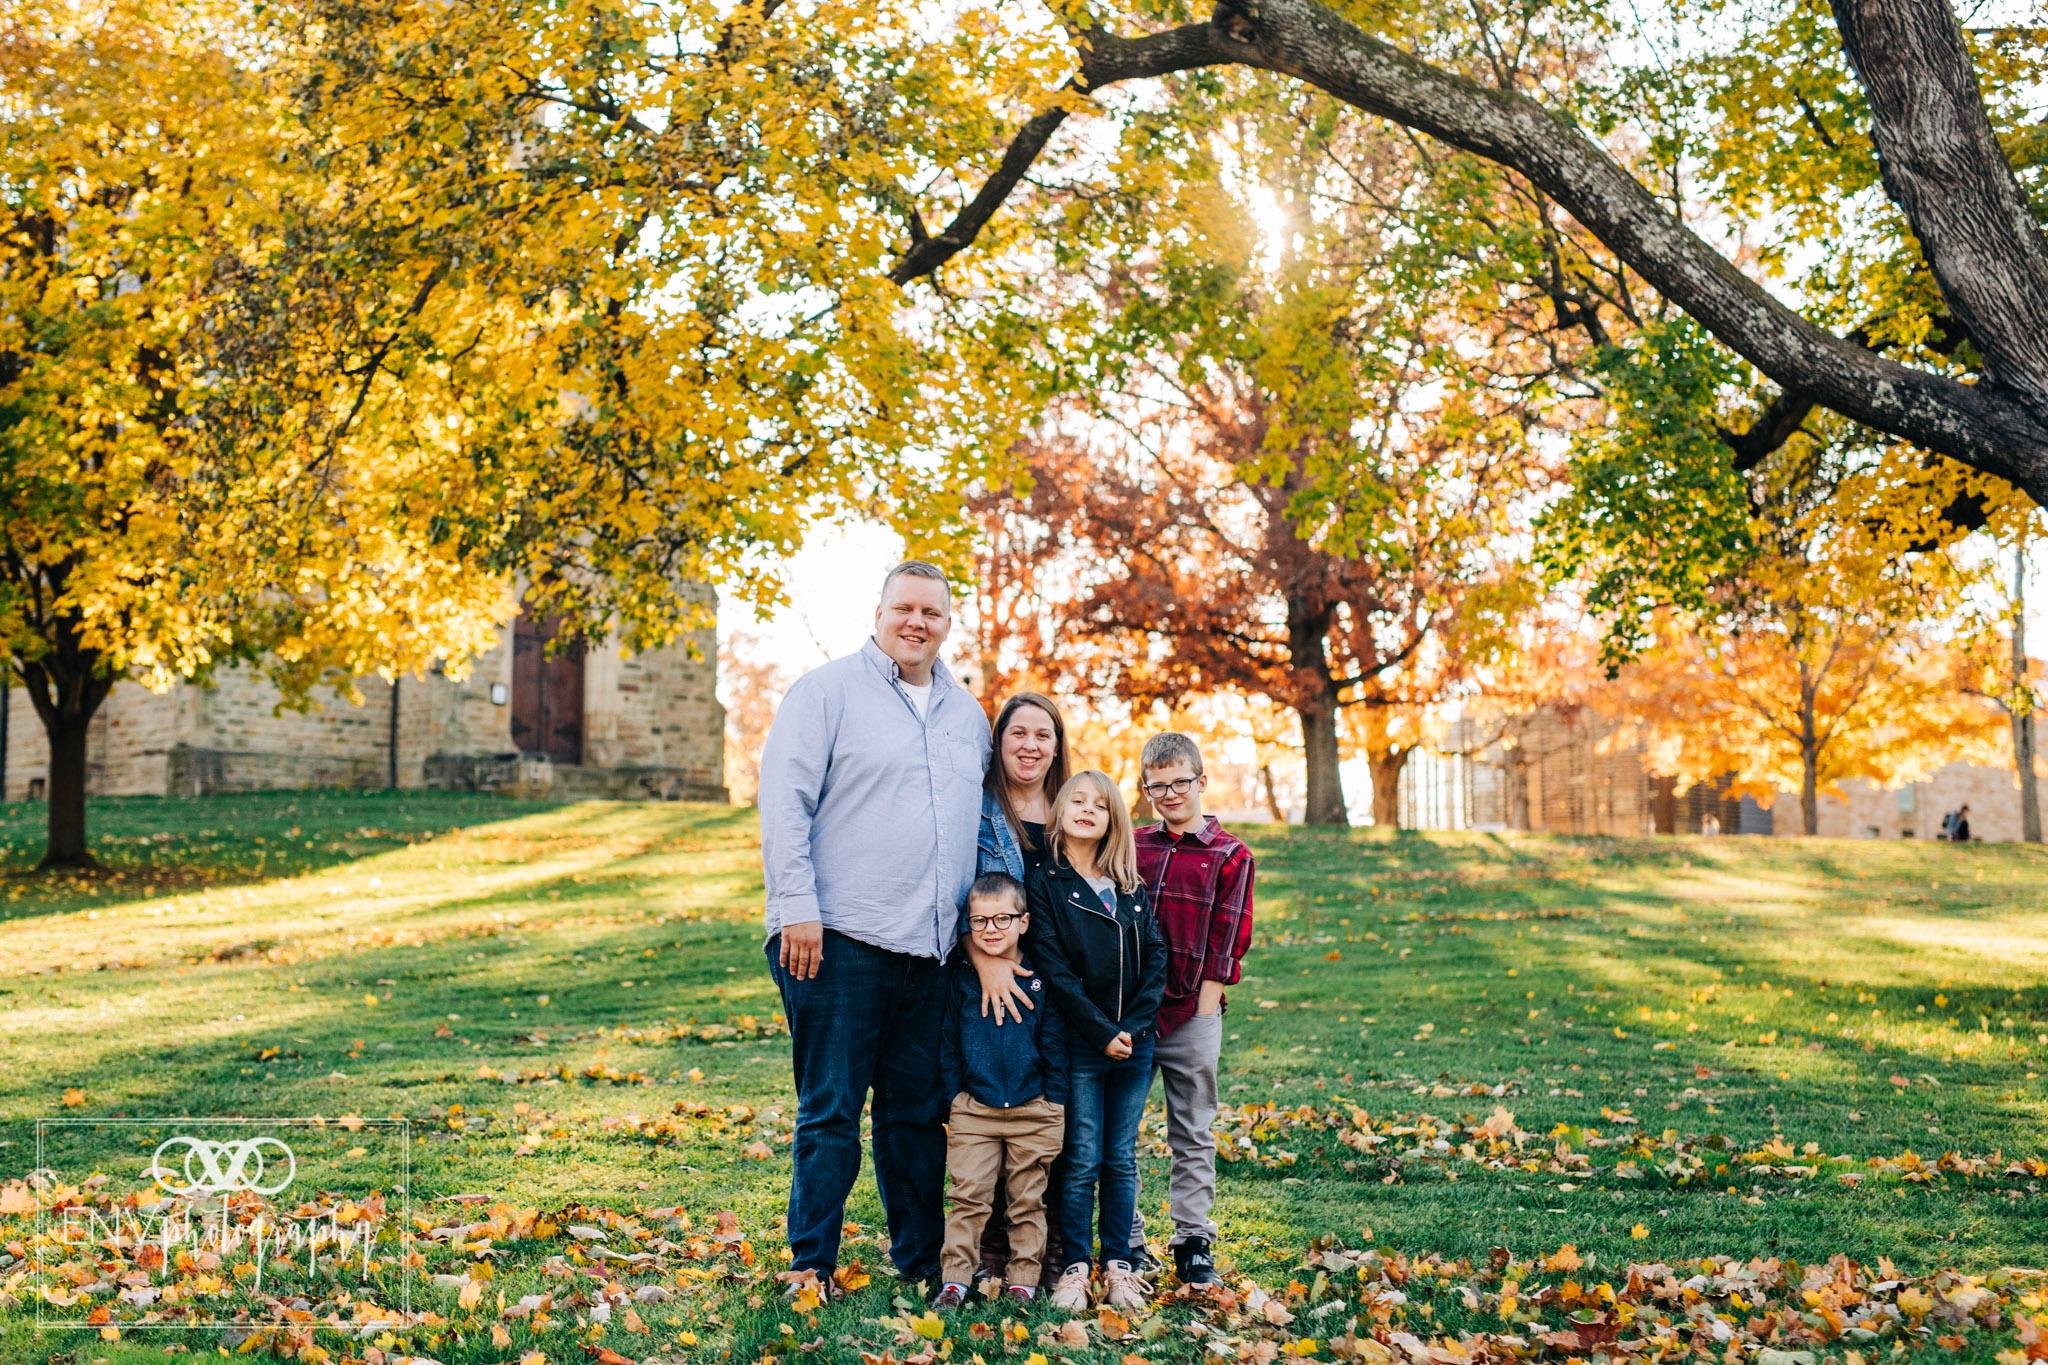 kenyon college columbus ohio fall family photography (2).jpg